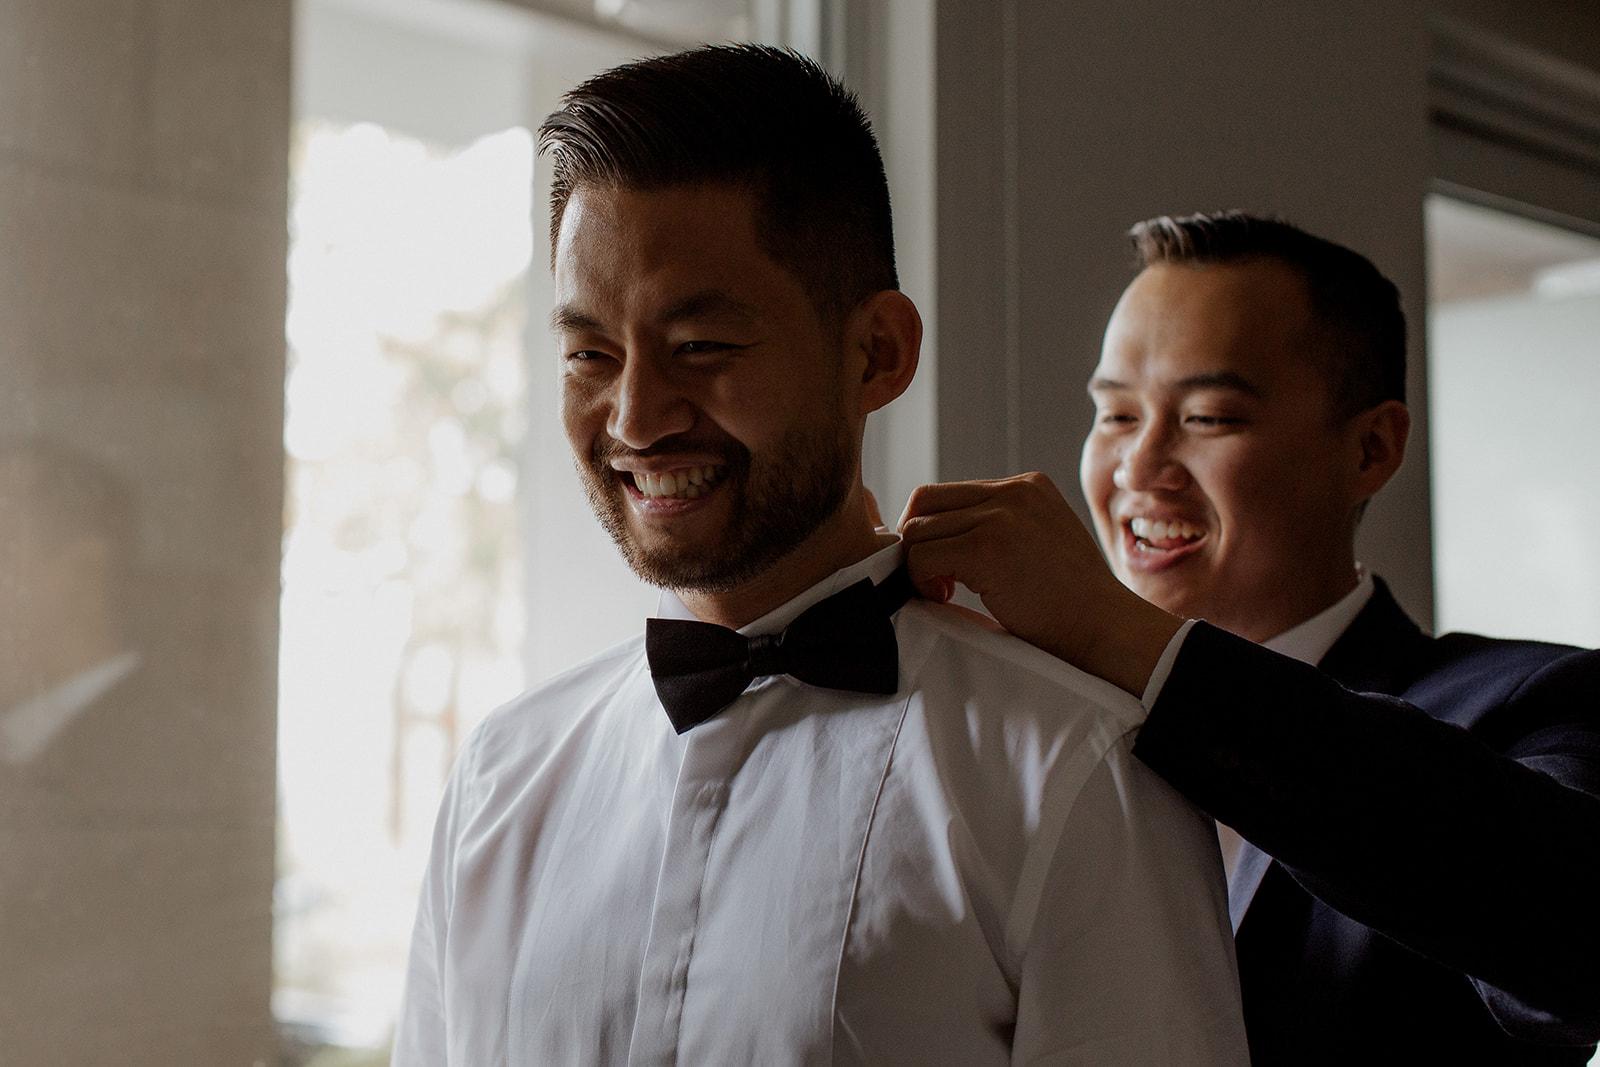 UBC Rose Garden Wedding Groom puts on bow tie